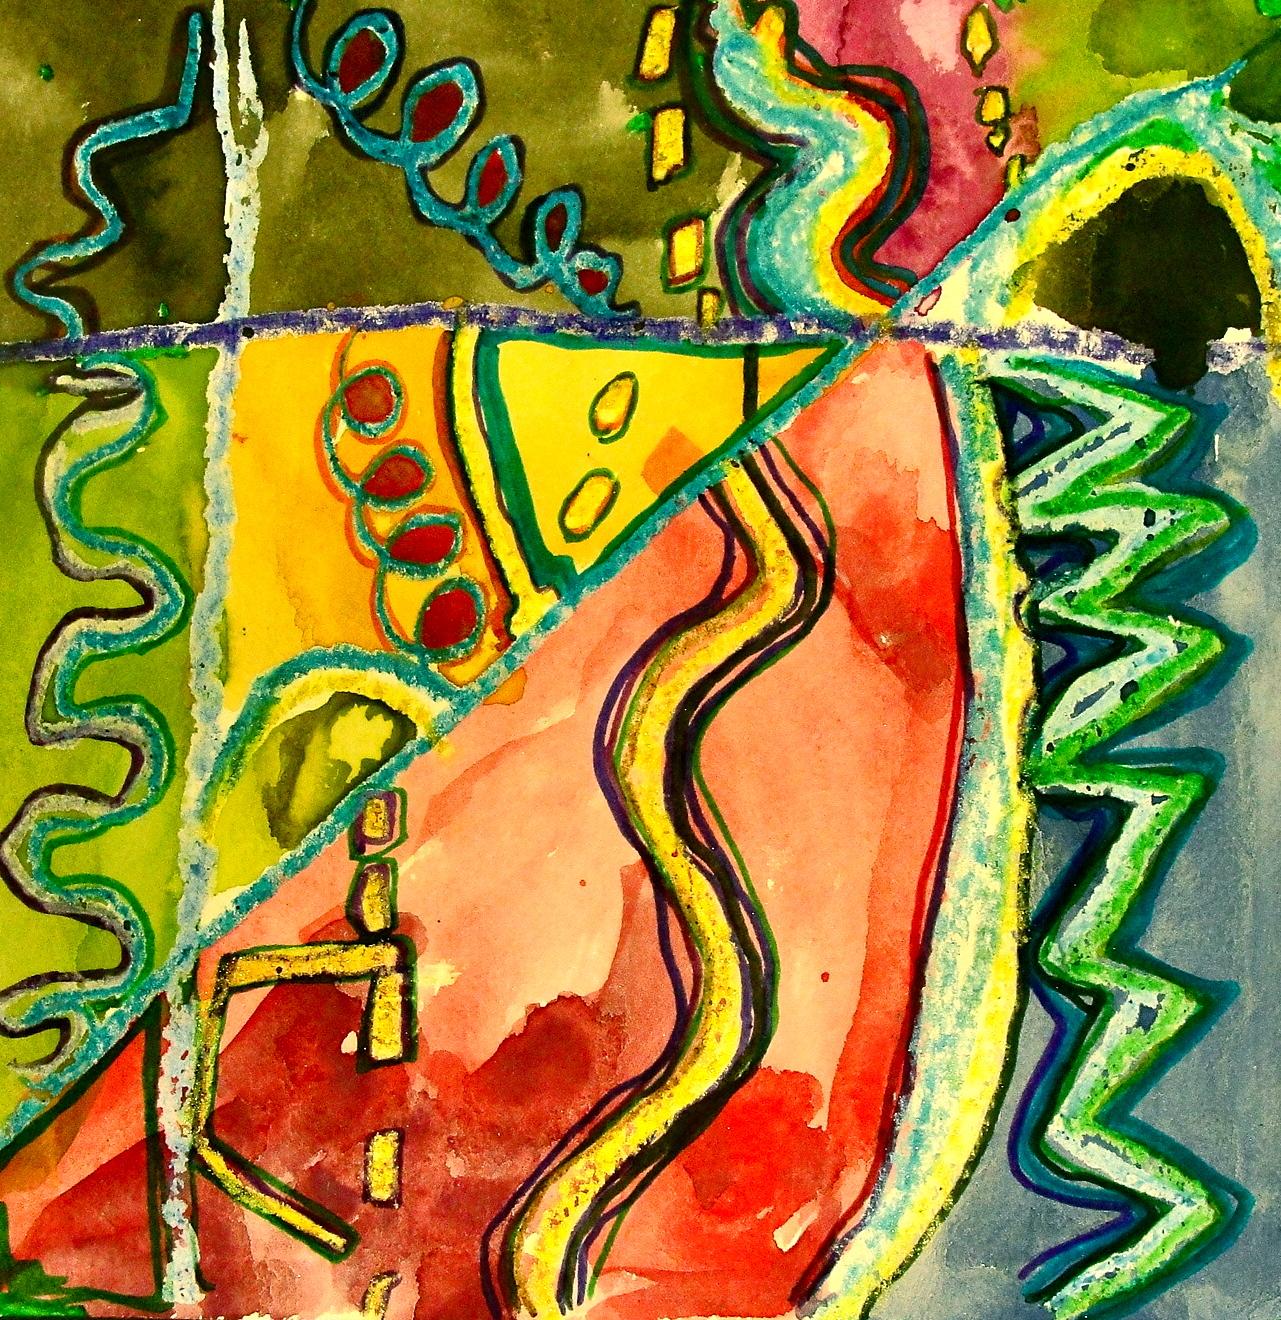 Line Art Grade 2 : Da vinci s wings st grade line paintings square art